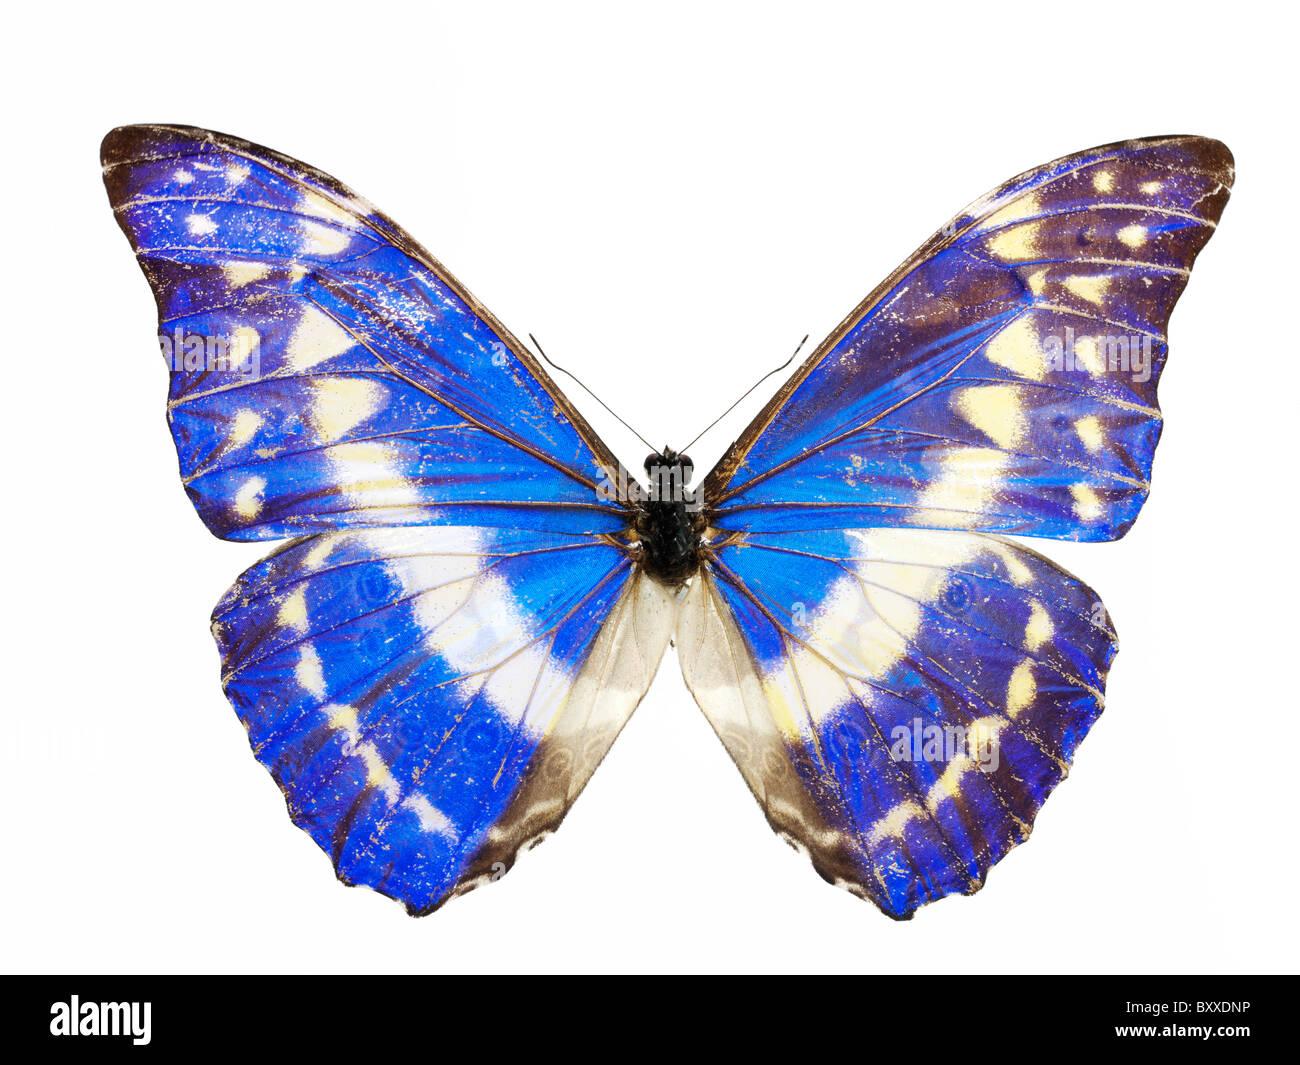 Elena mariposas Morpho Imagen De Stock